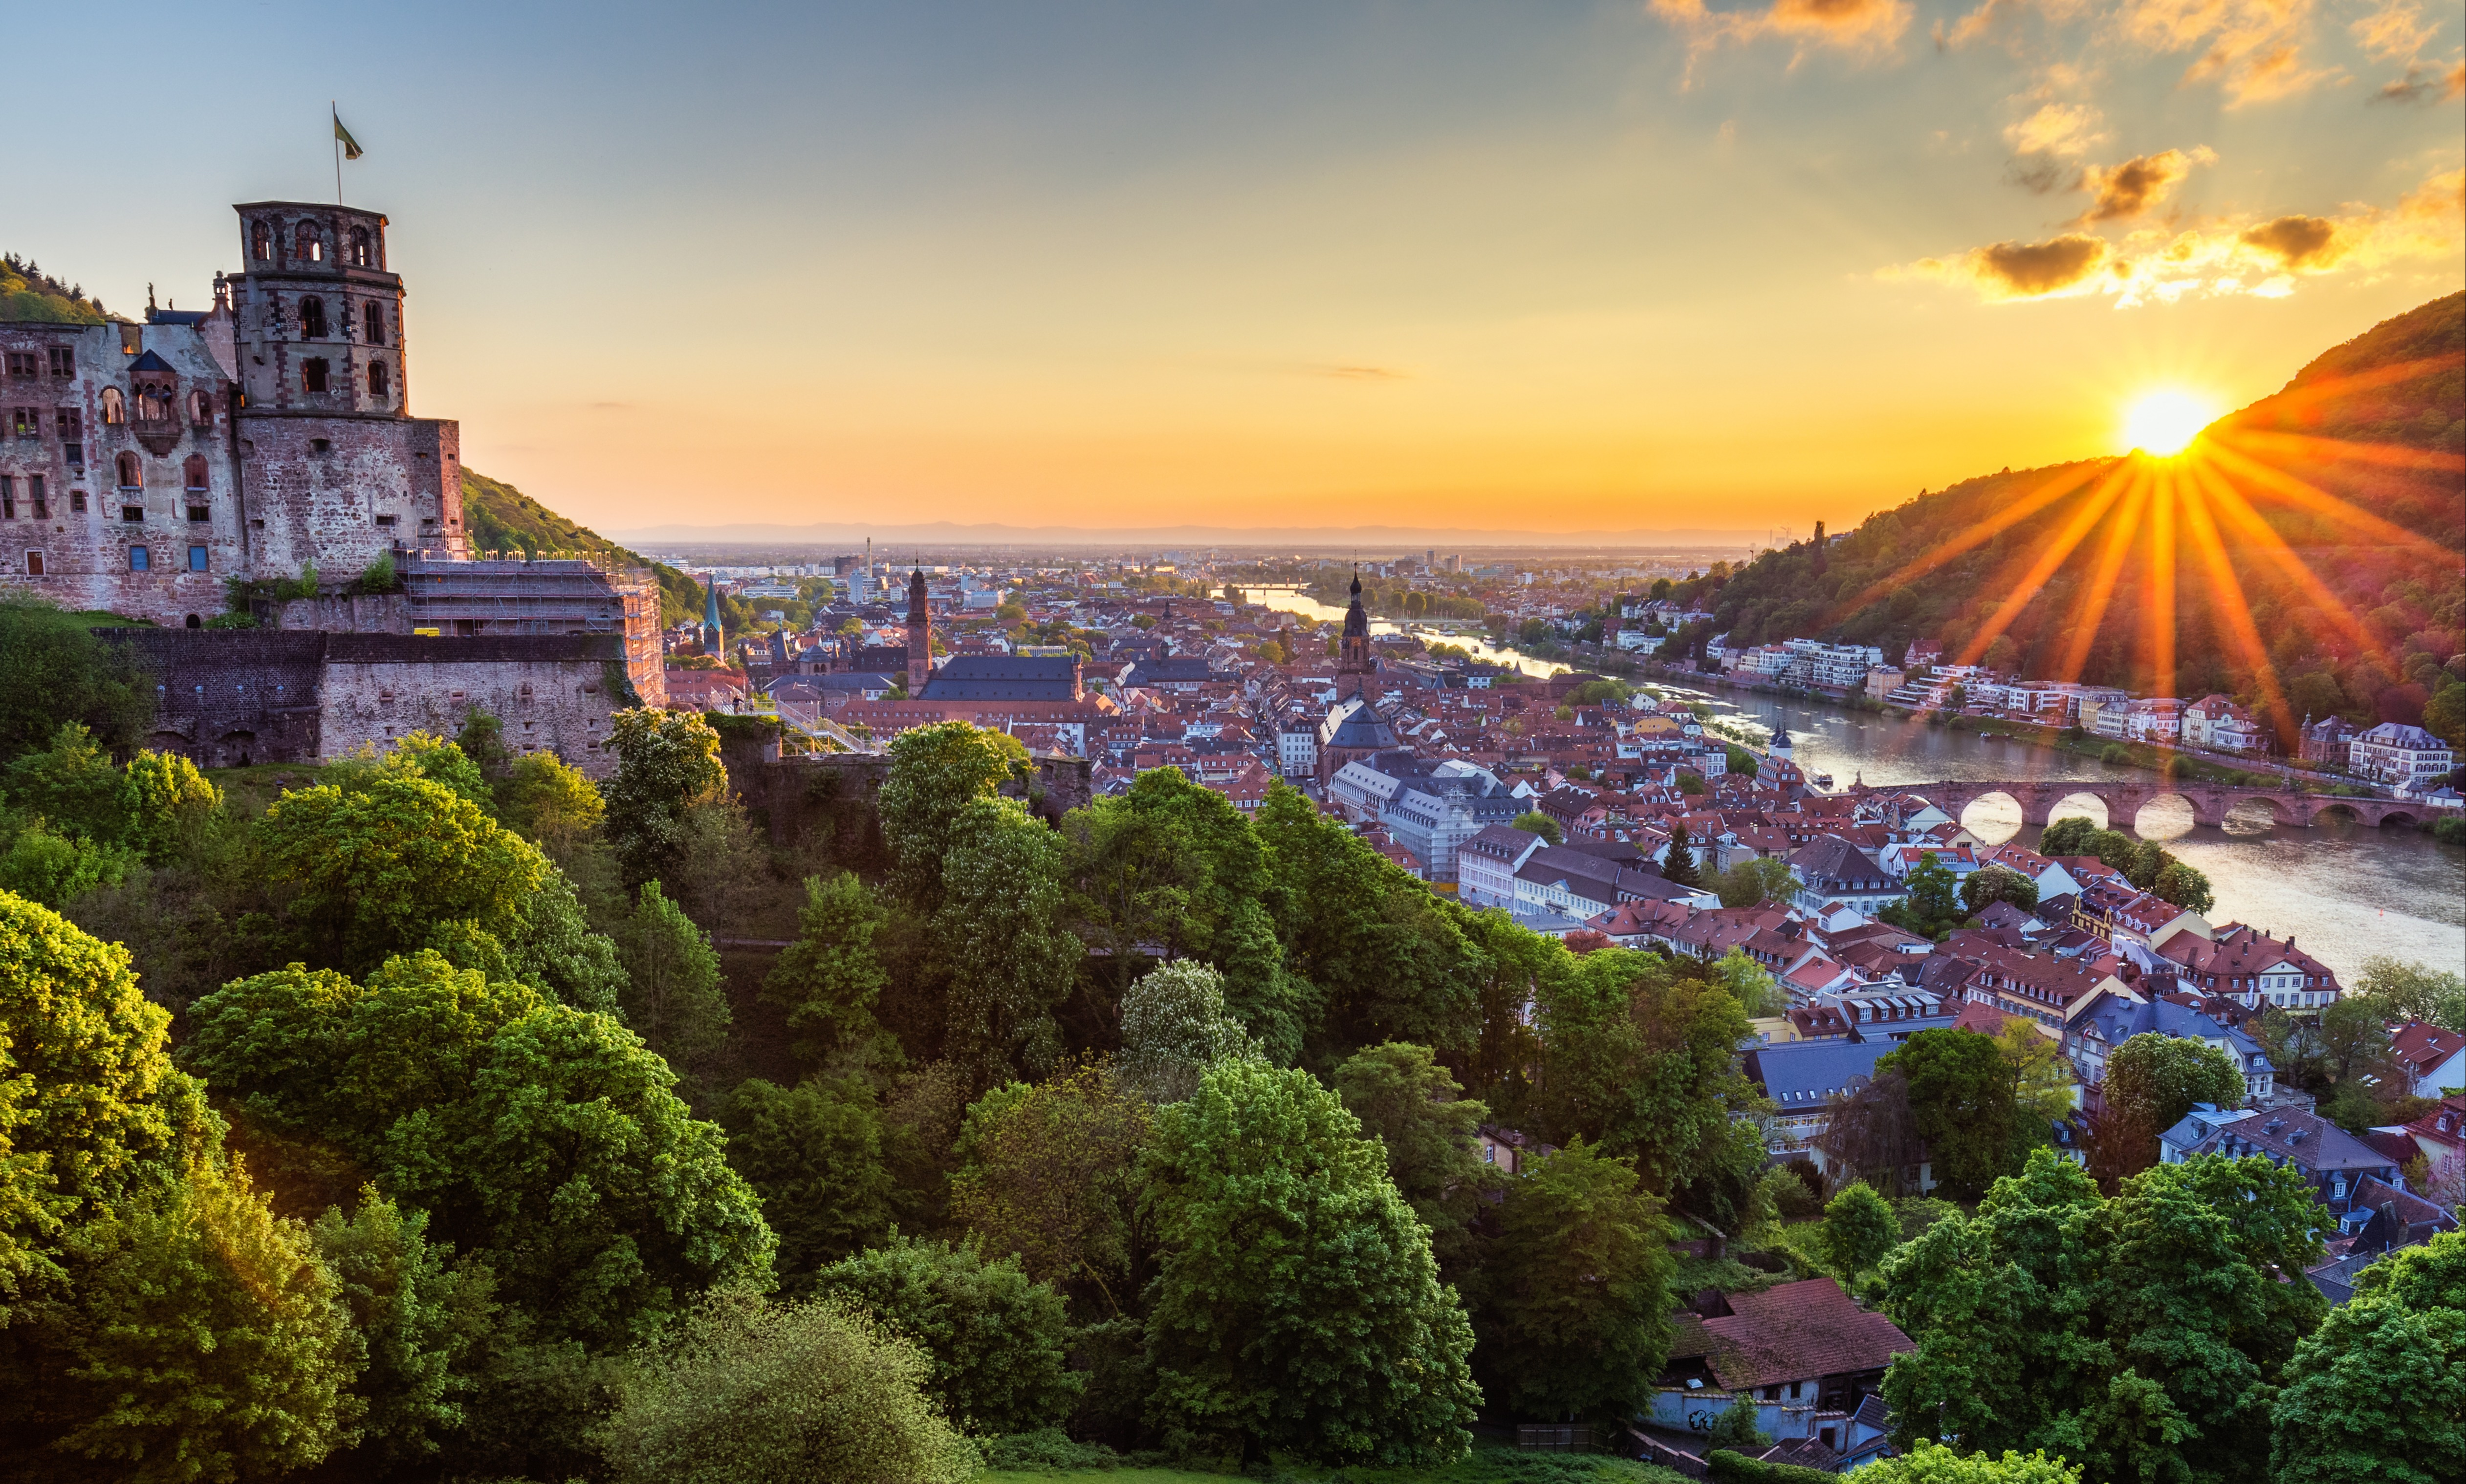 Rhine River Heidelberg, Germany